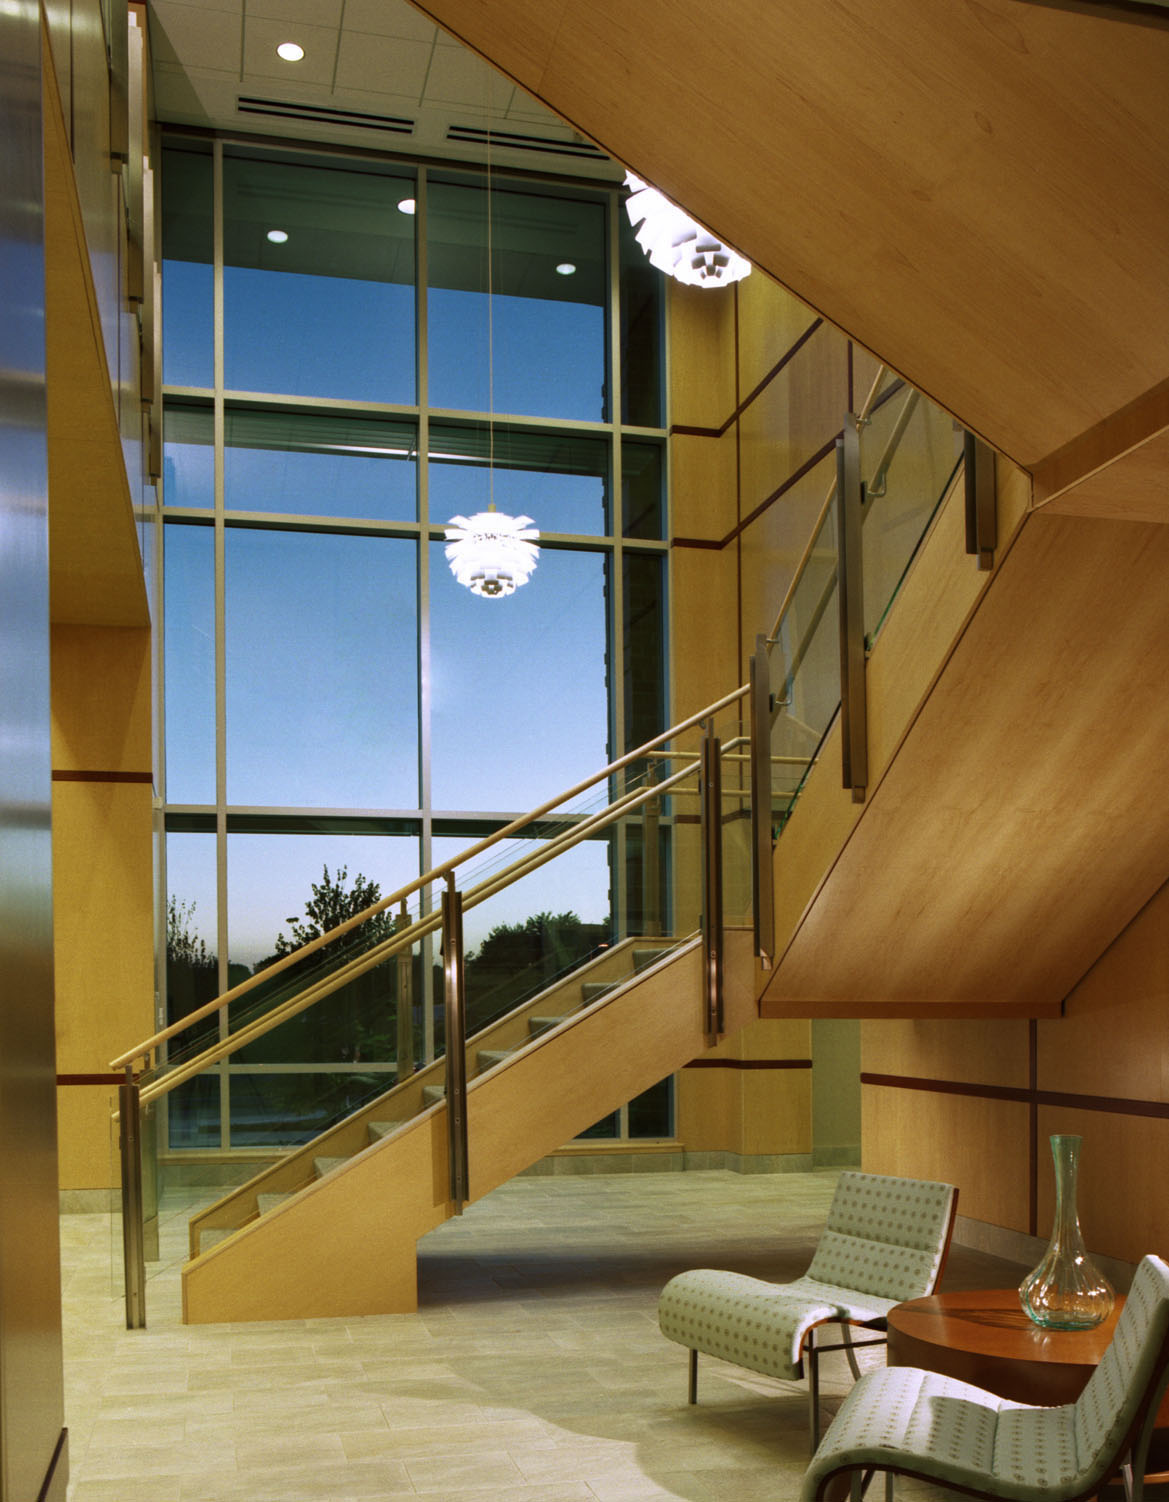 Kensey Interior Cropped.jpg